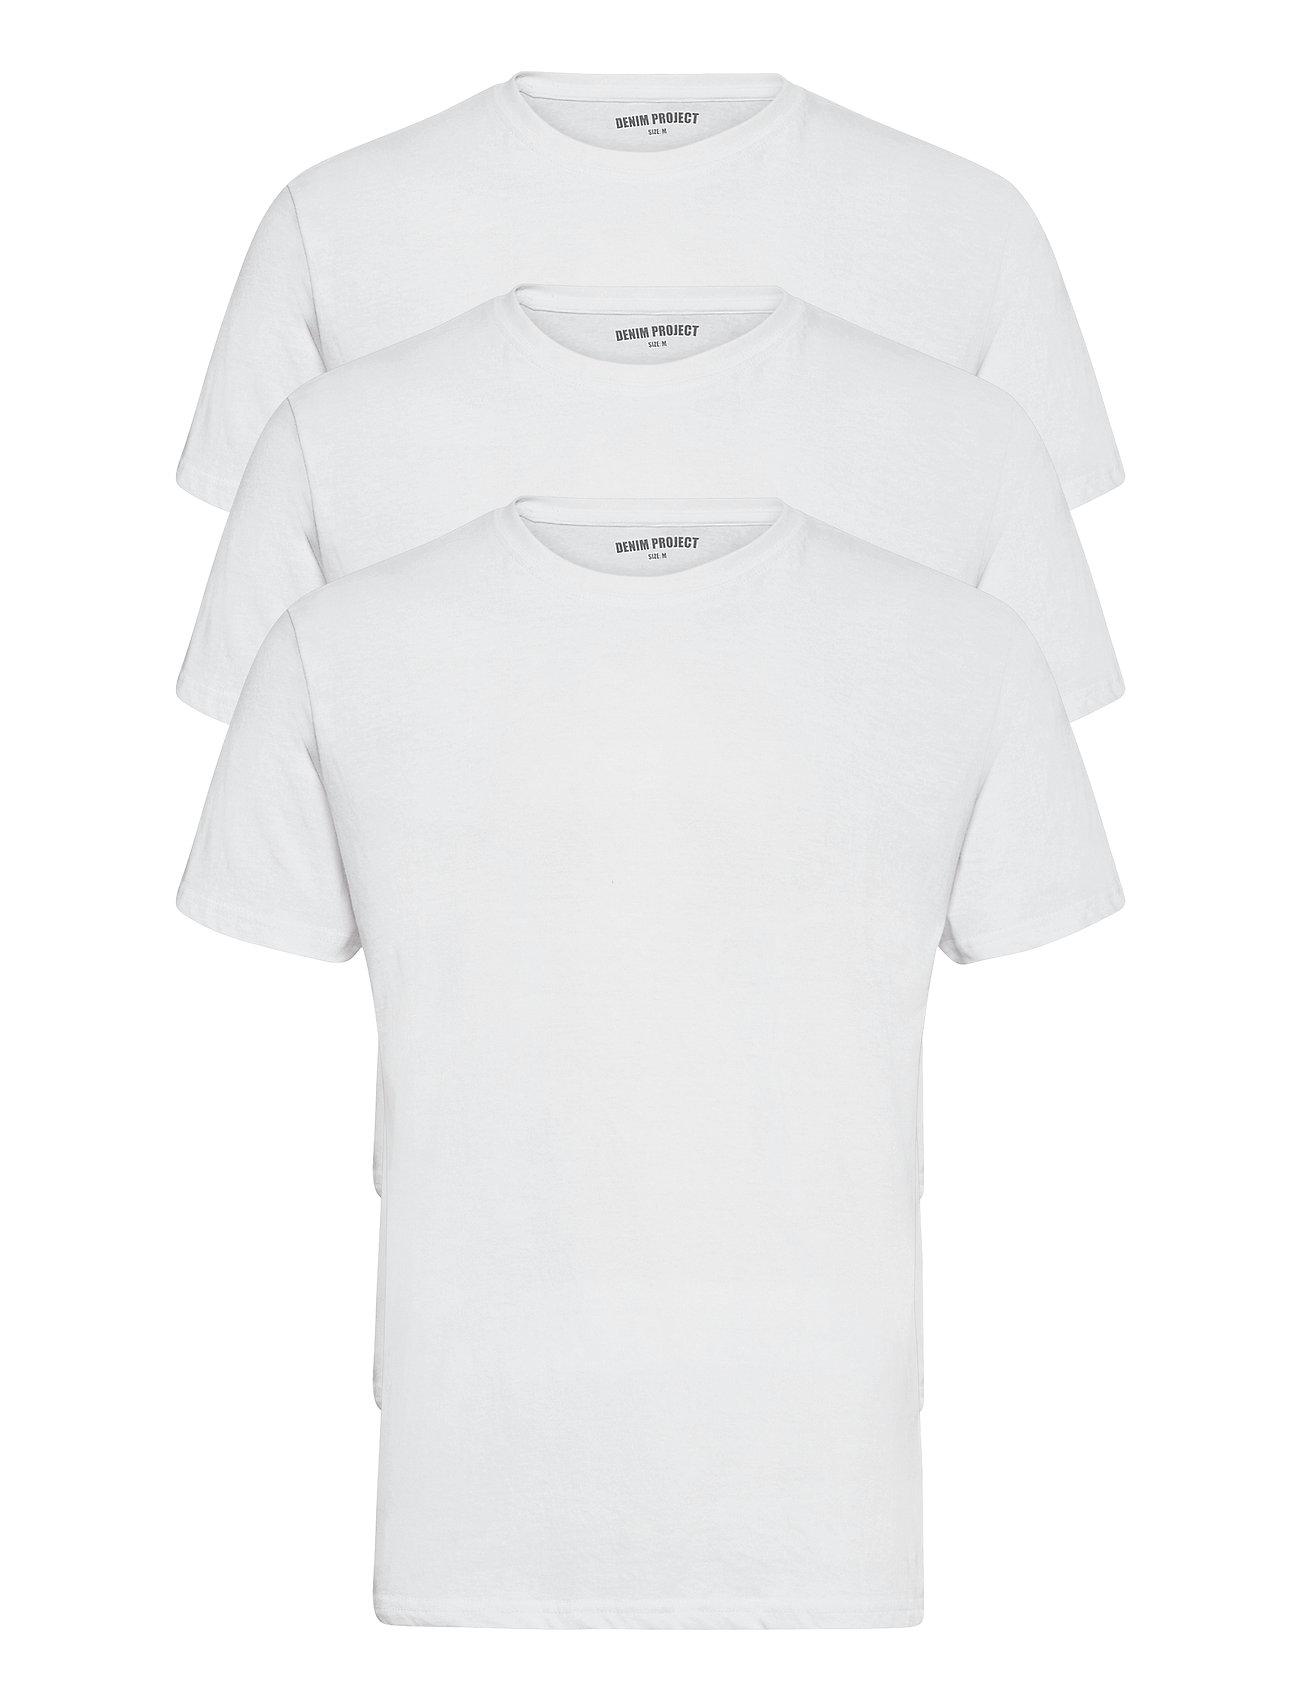 Image of 3 Pack T-Shirts T-shirt Hvid Denim Project (3484641457)